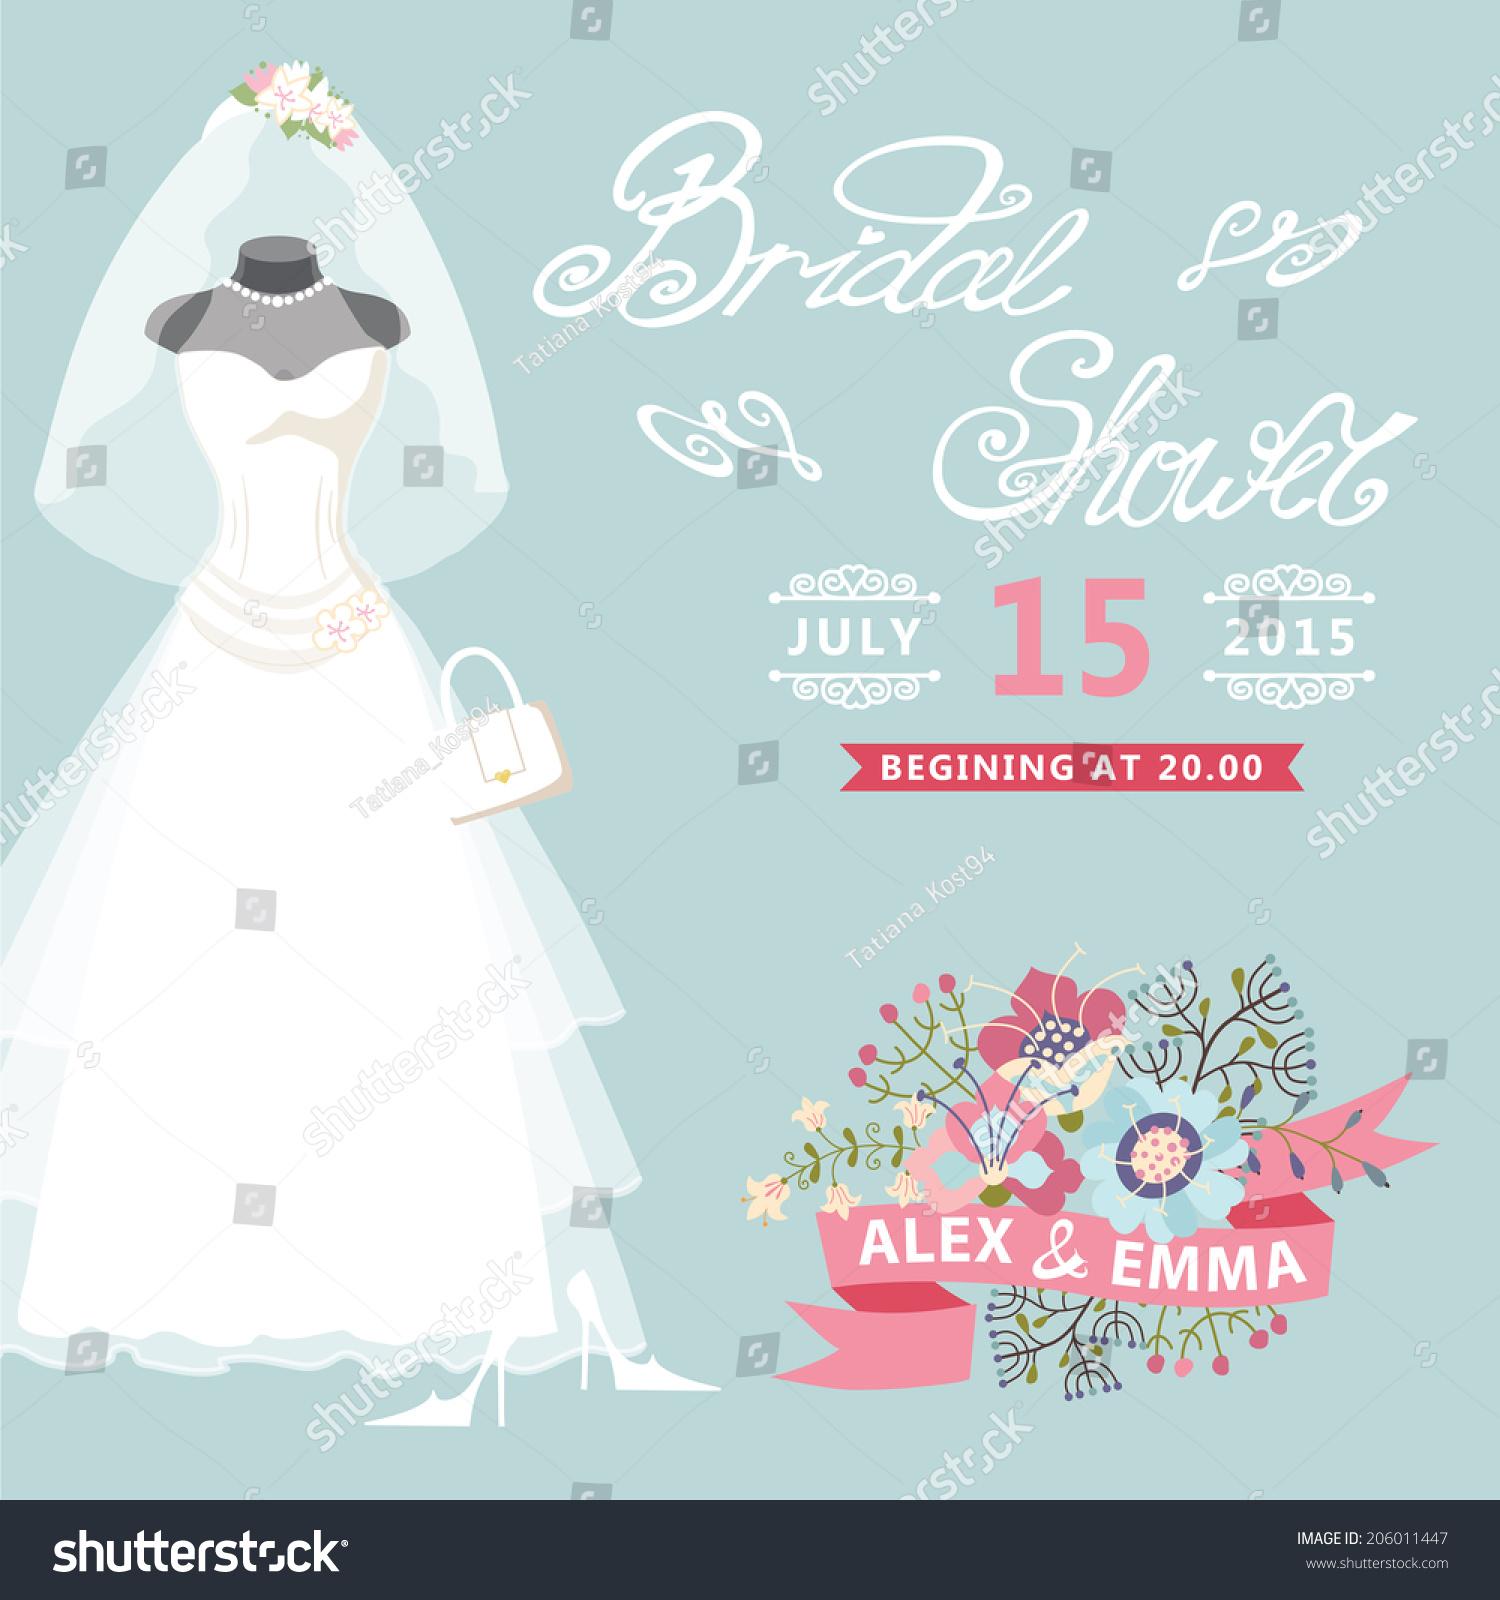 Bridal Shower Card Floral Elements Composition Stock Vector